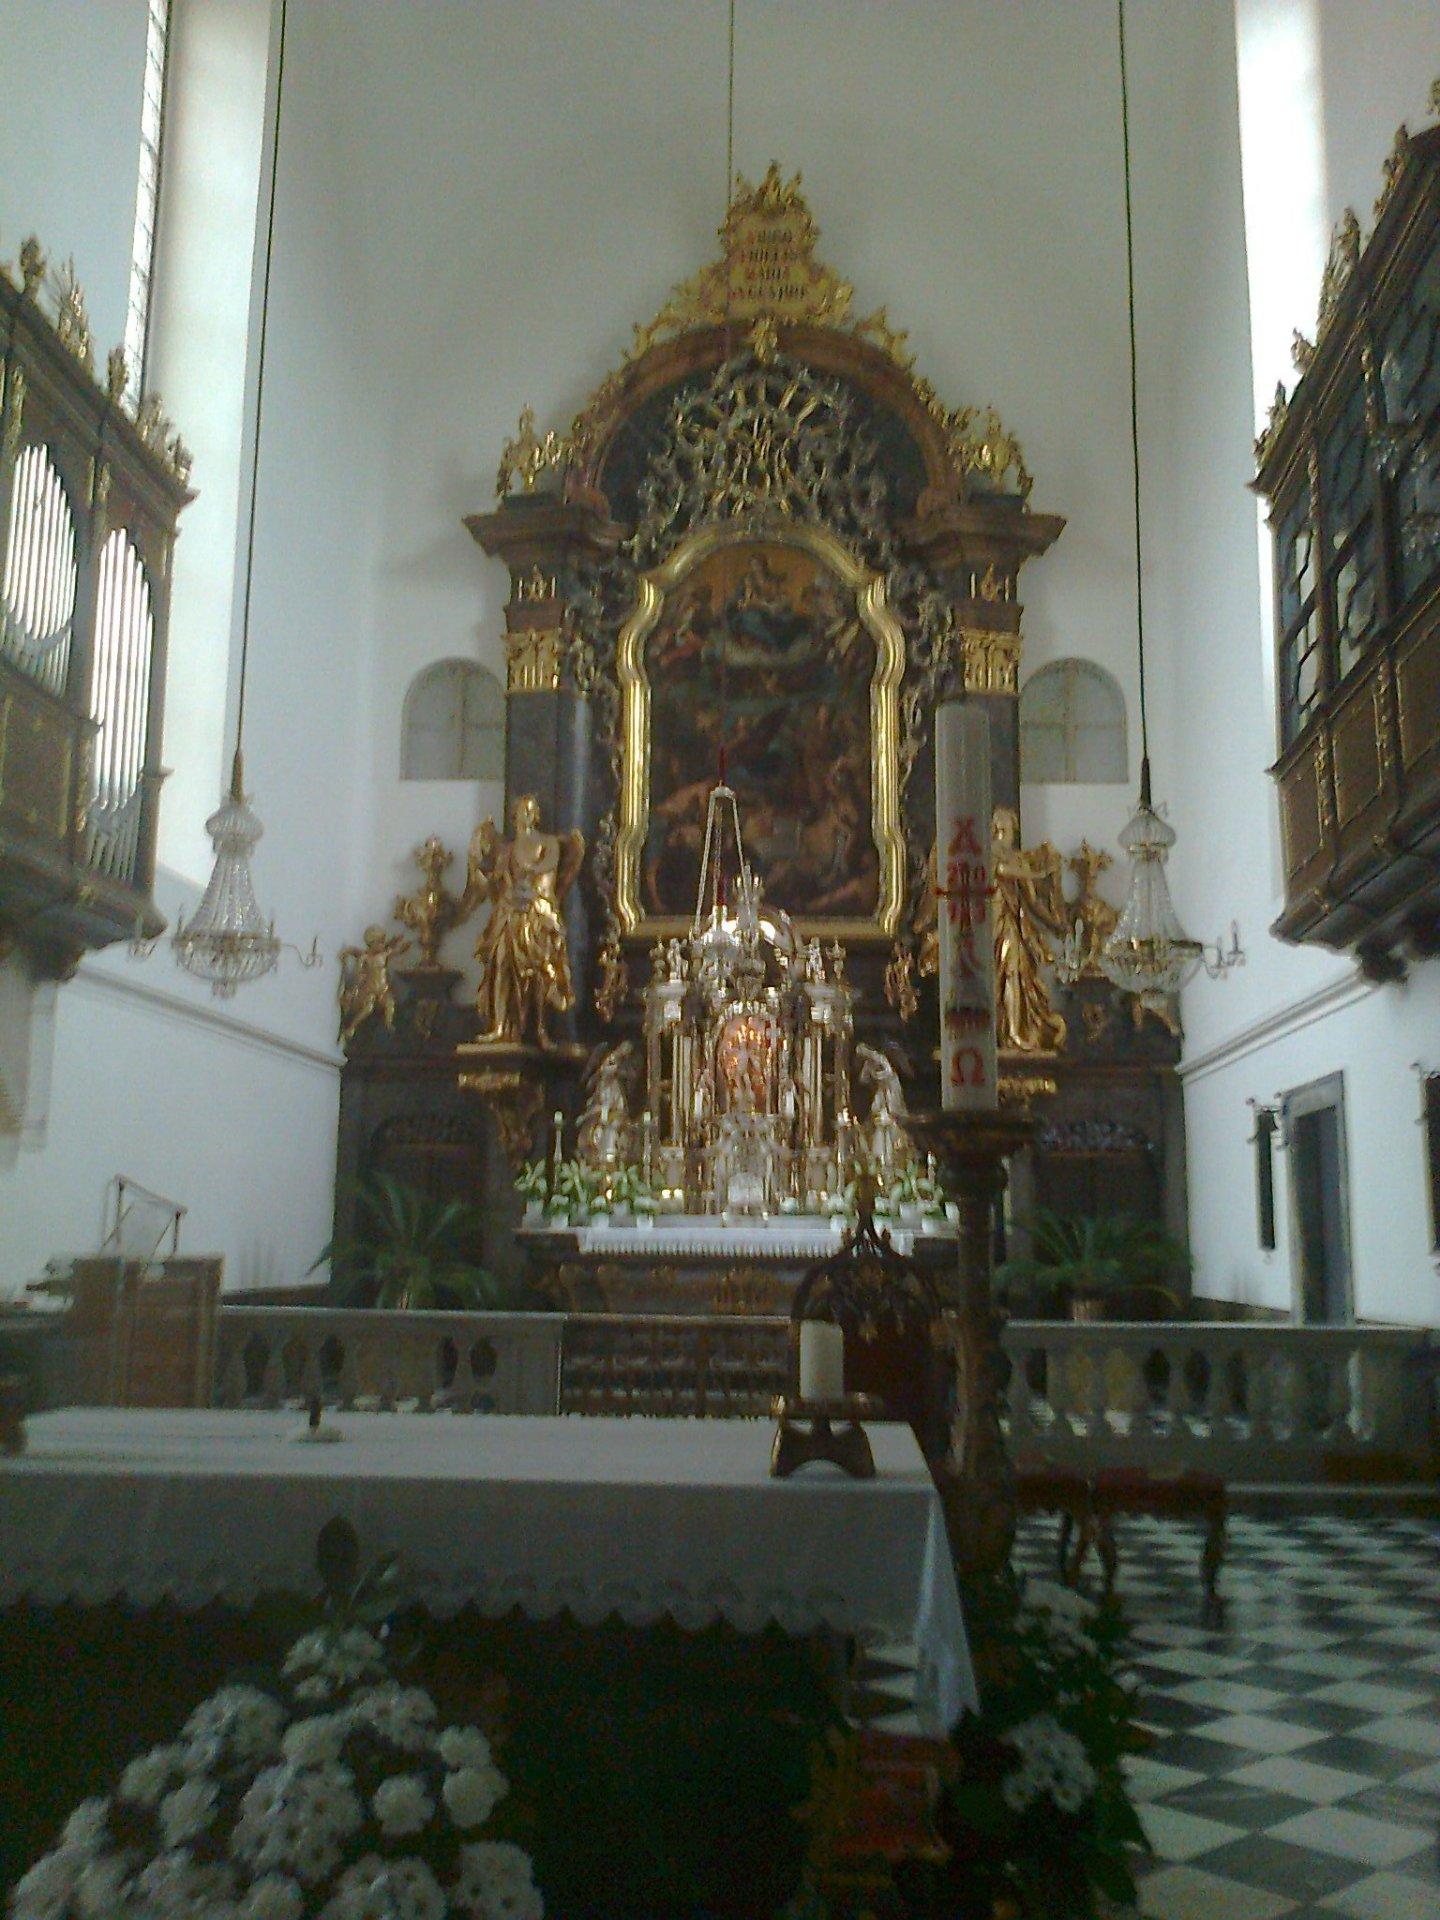 Graz church 4 - Graz: tradition and modernity